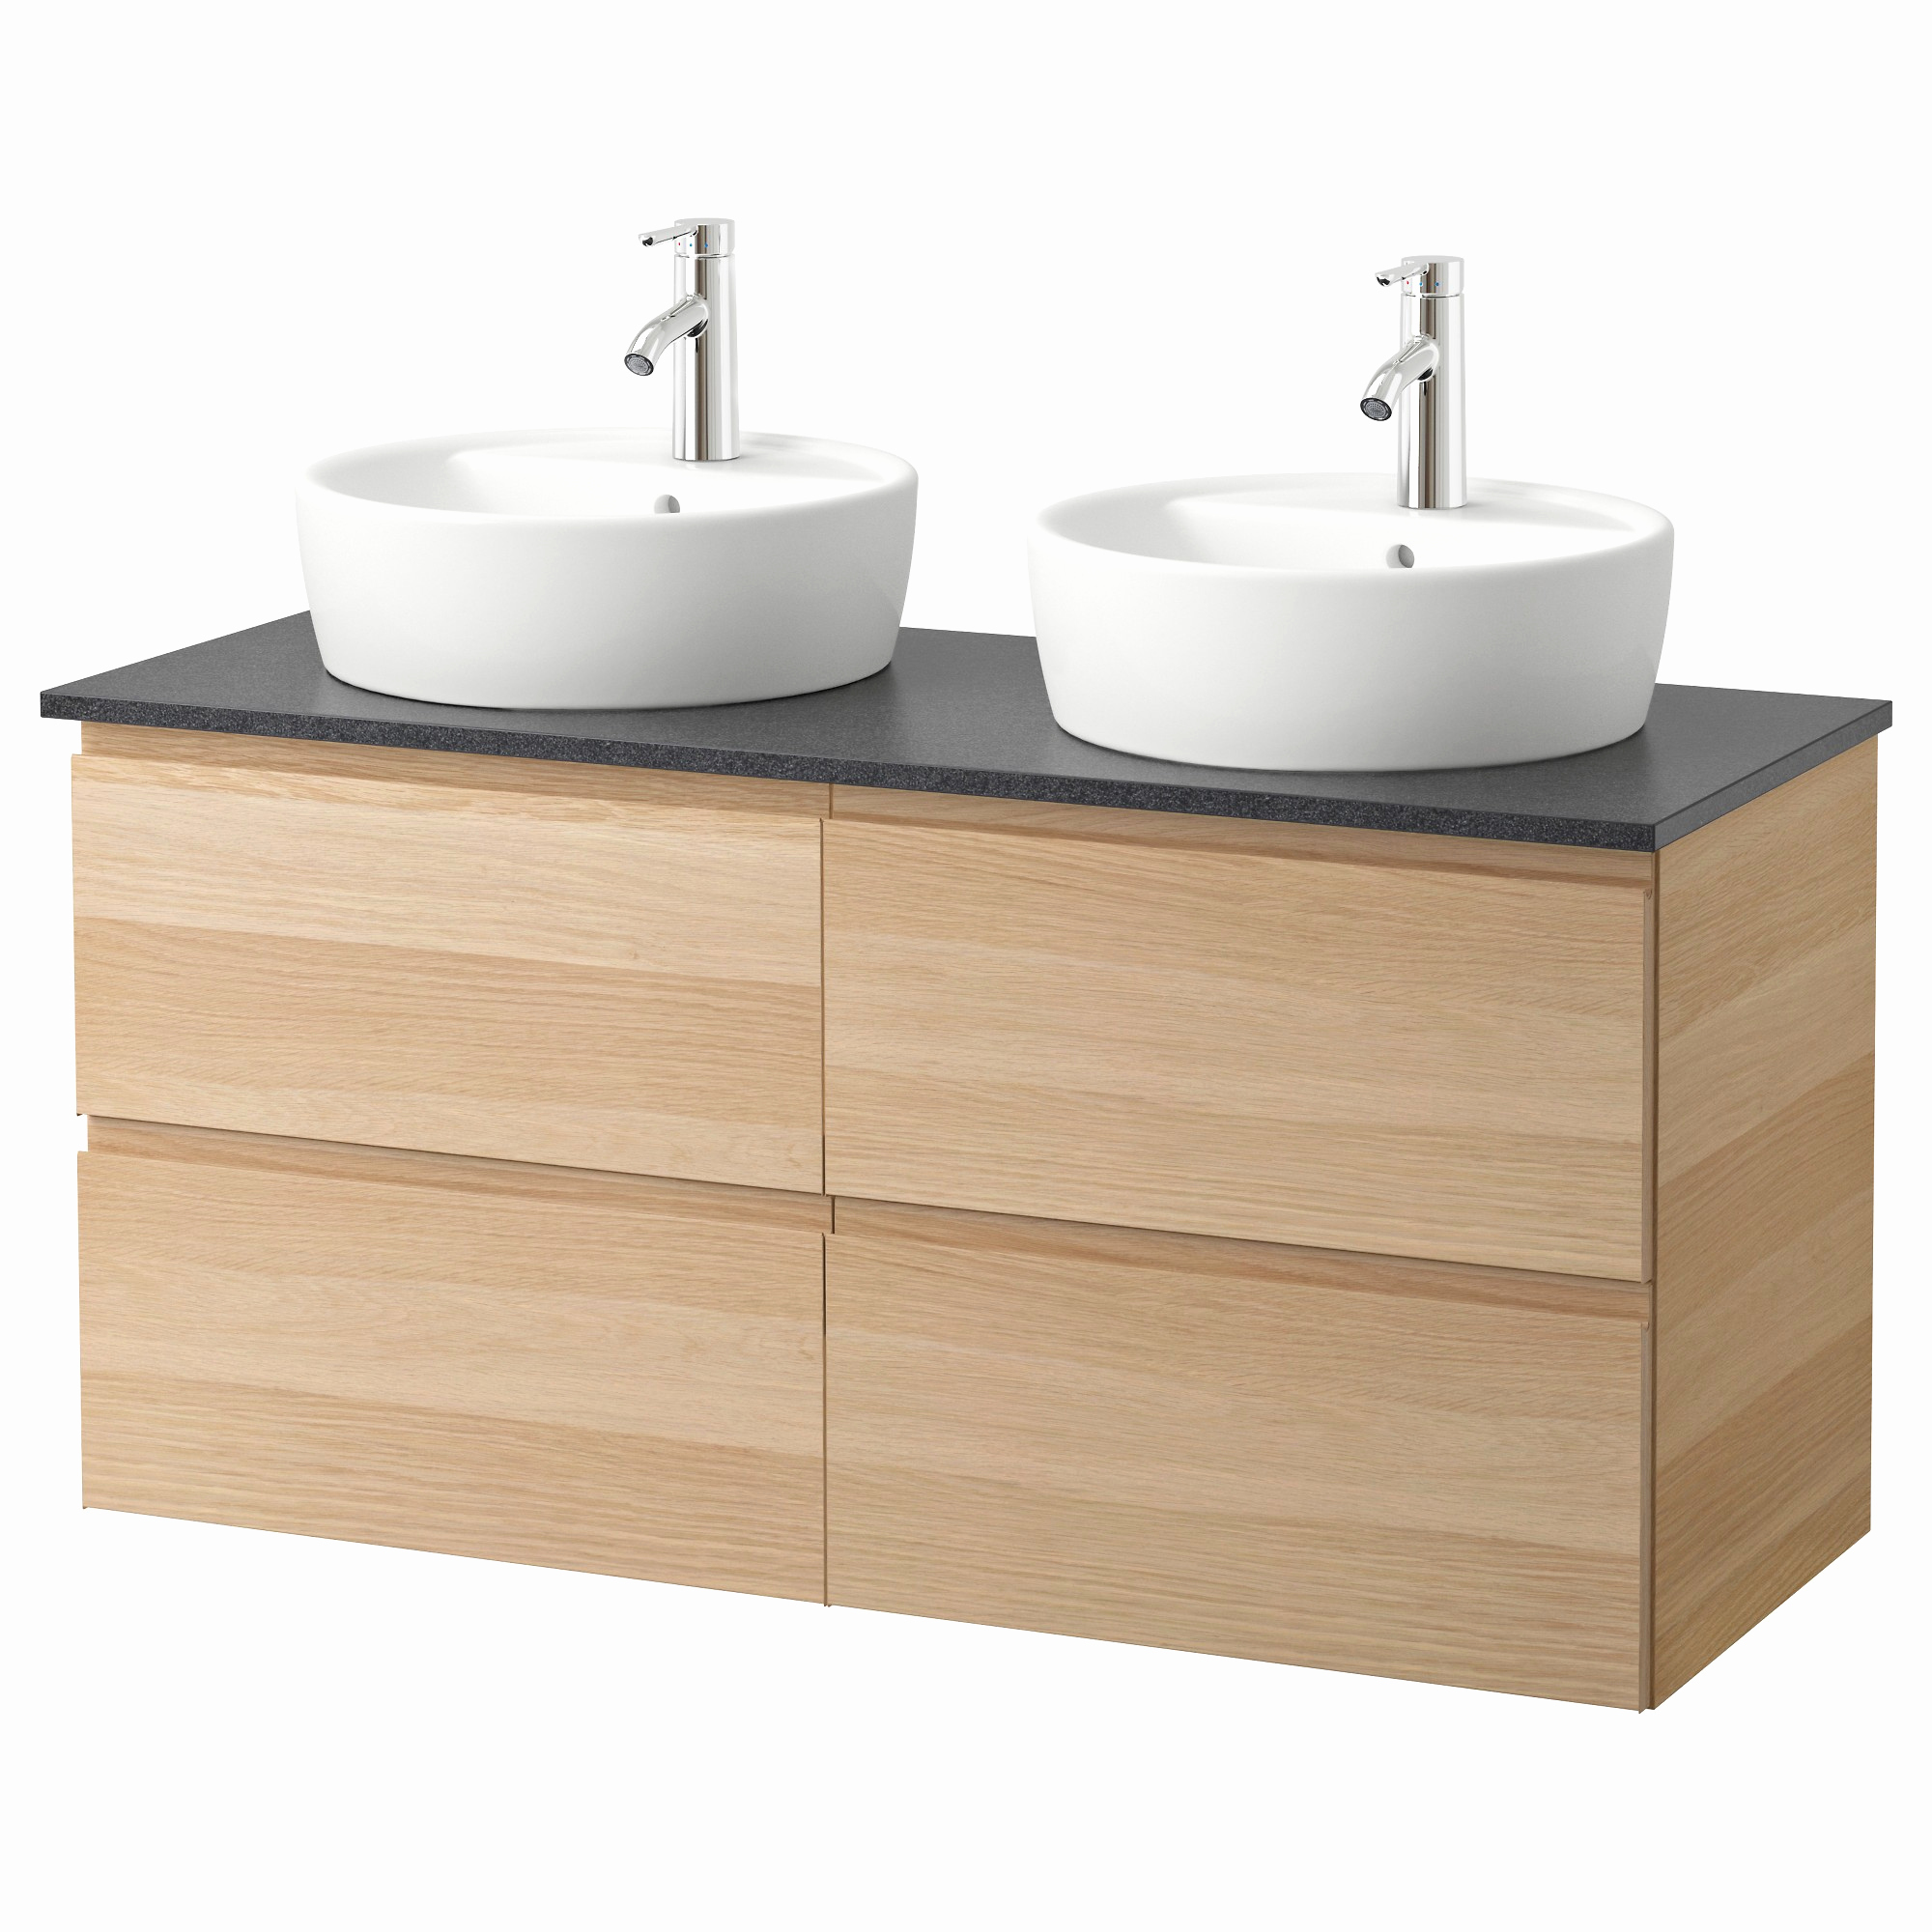 Lavabo Double Vasque Ikea Inspirant Image Double Vasque Ikea Inspirant Inspirational Ikea Meuble Double Vasque